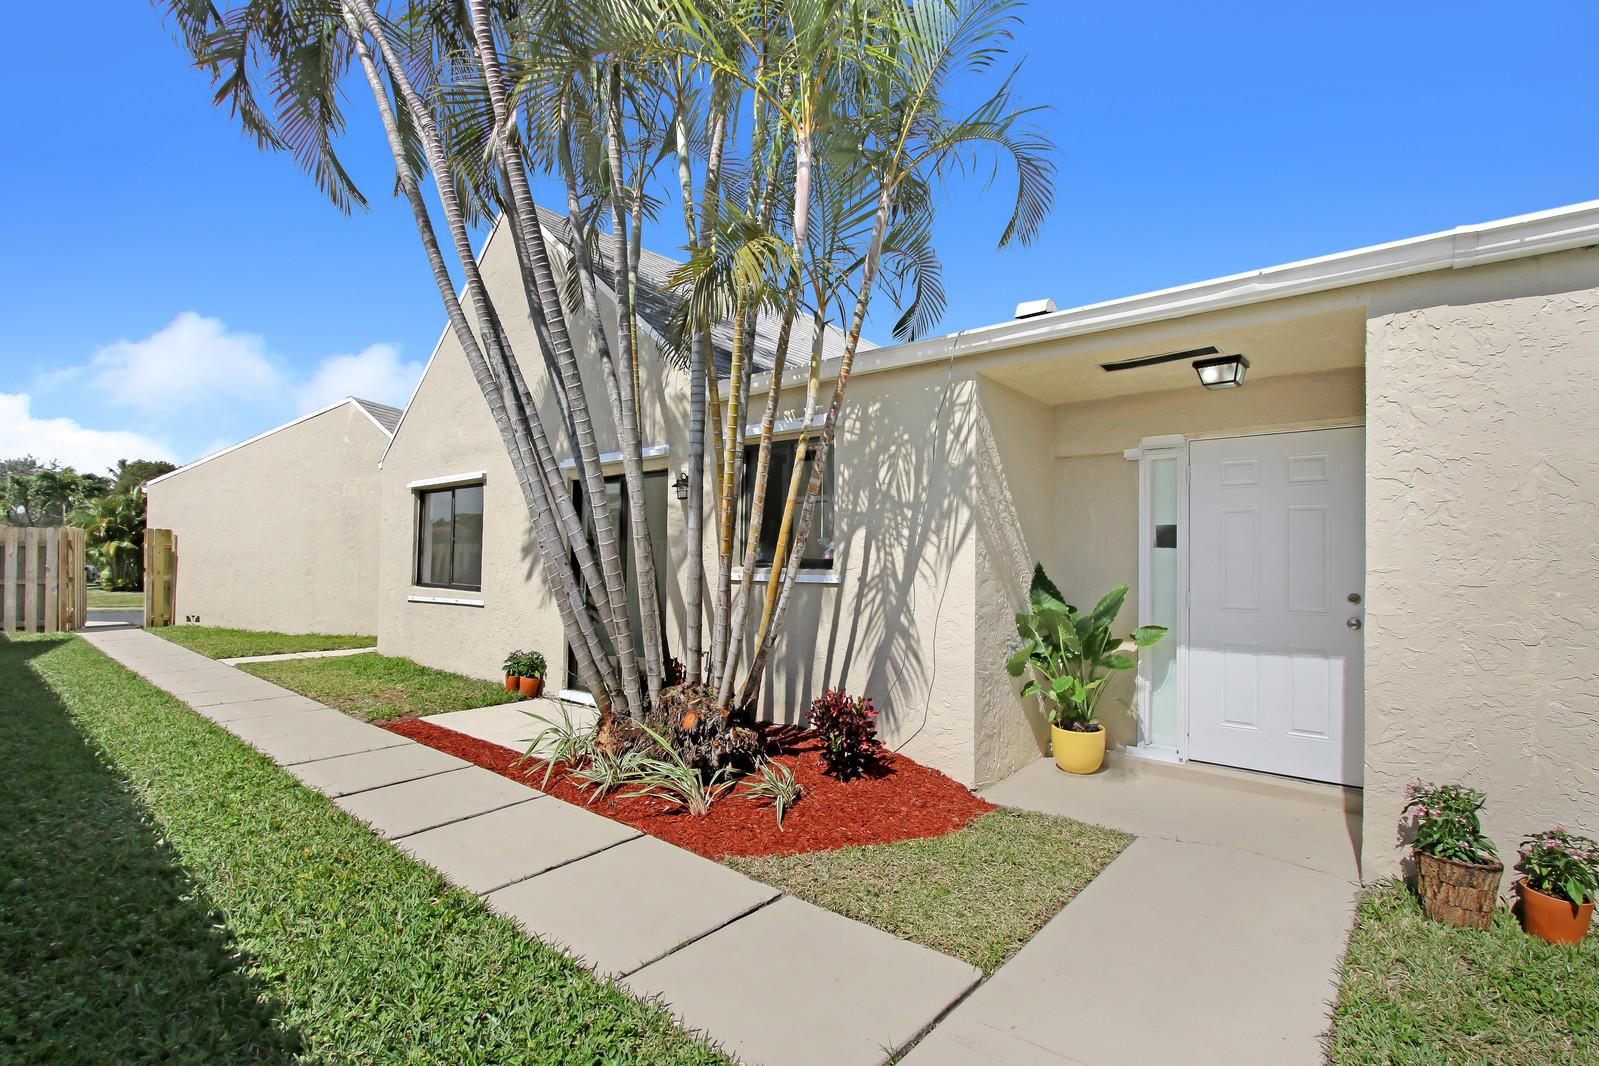 2127 Nw 12th Street, Delray Beach, FL 33445